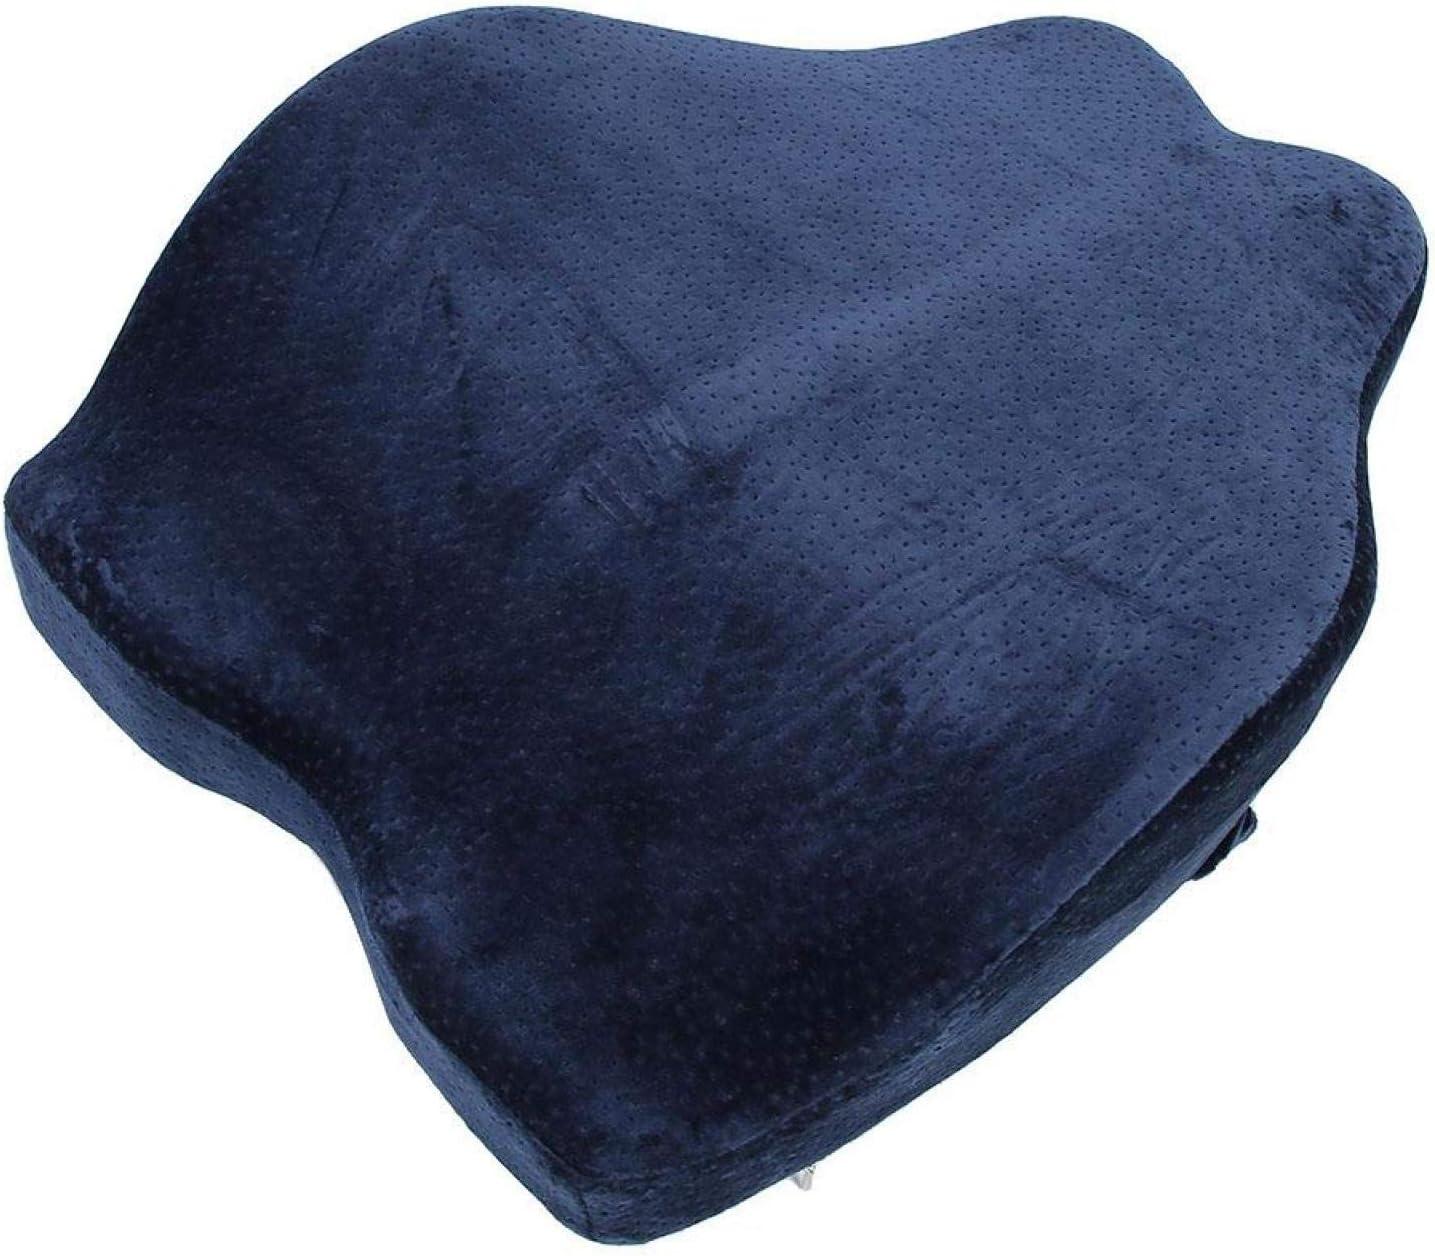 Uxsiya Backrest Pillow Light-Weight Large special price !! Practical Nashville-Davidson Mall Comfortable Lumbar